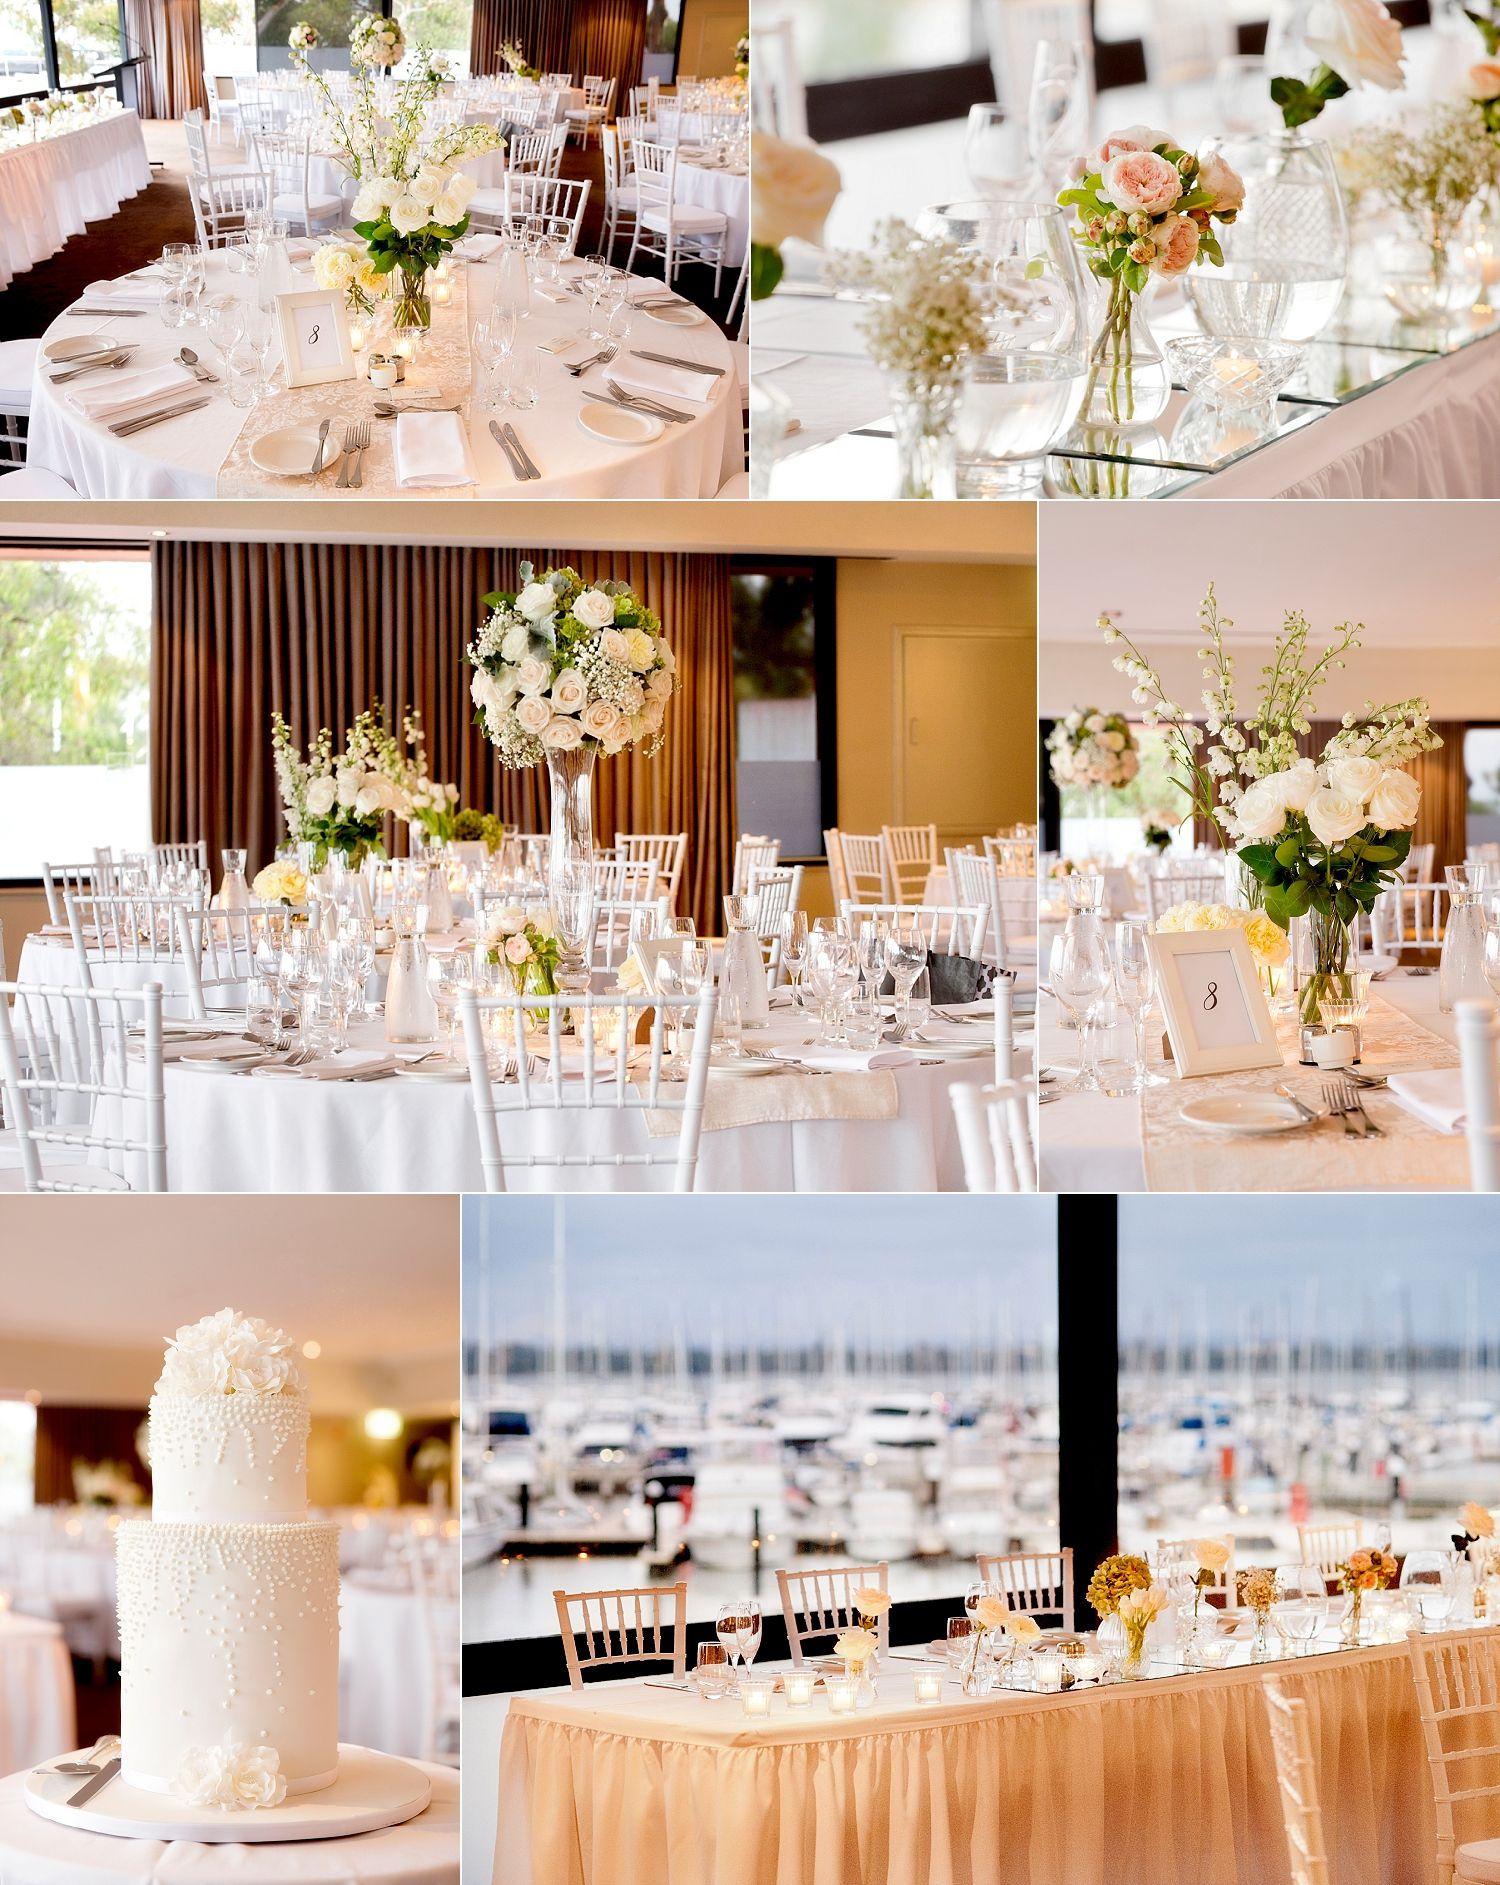 Matilda Bay Wedding Reception Venue Upstairs River View Room Wedding Reception Venues Bay Wedding Restaurant Wedding Receptions